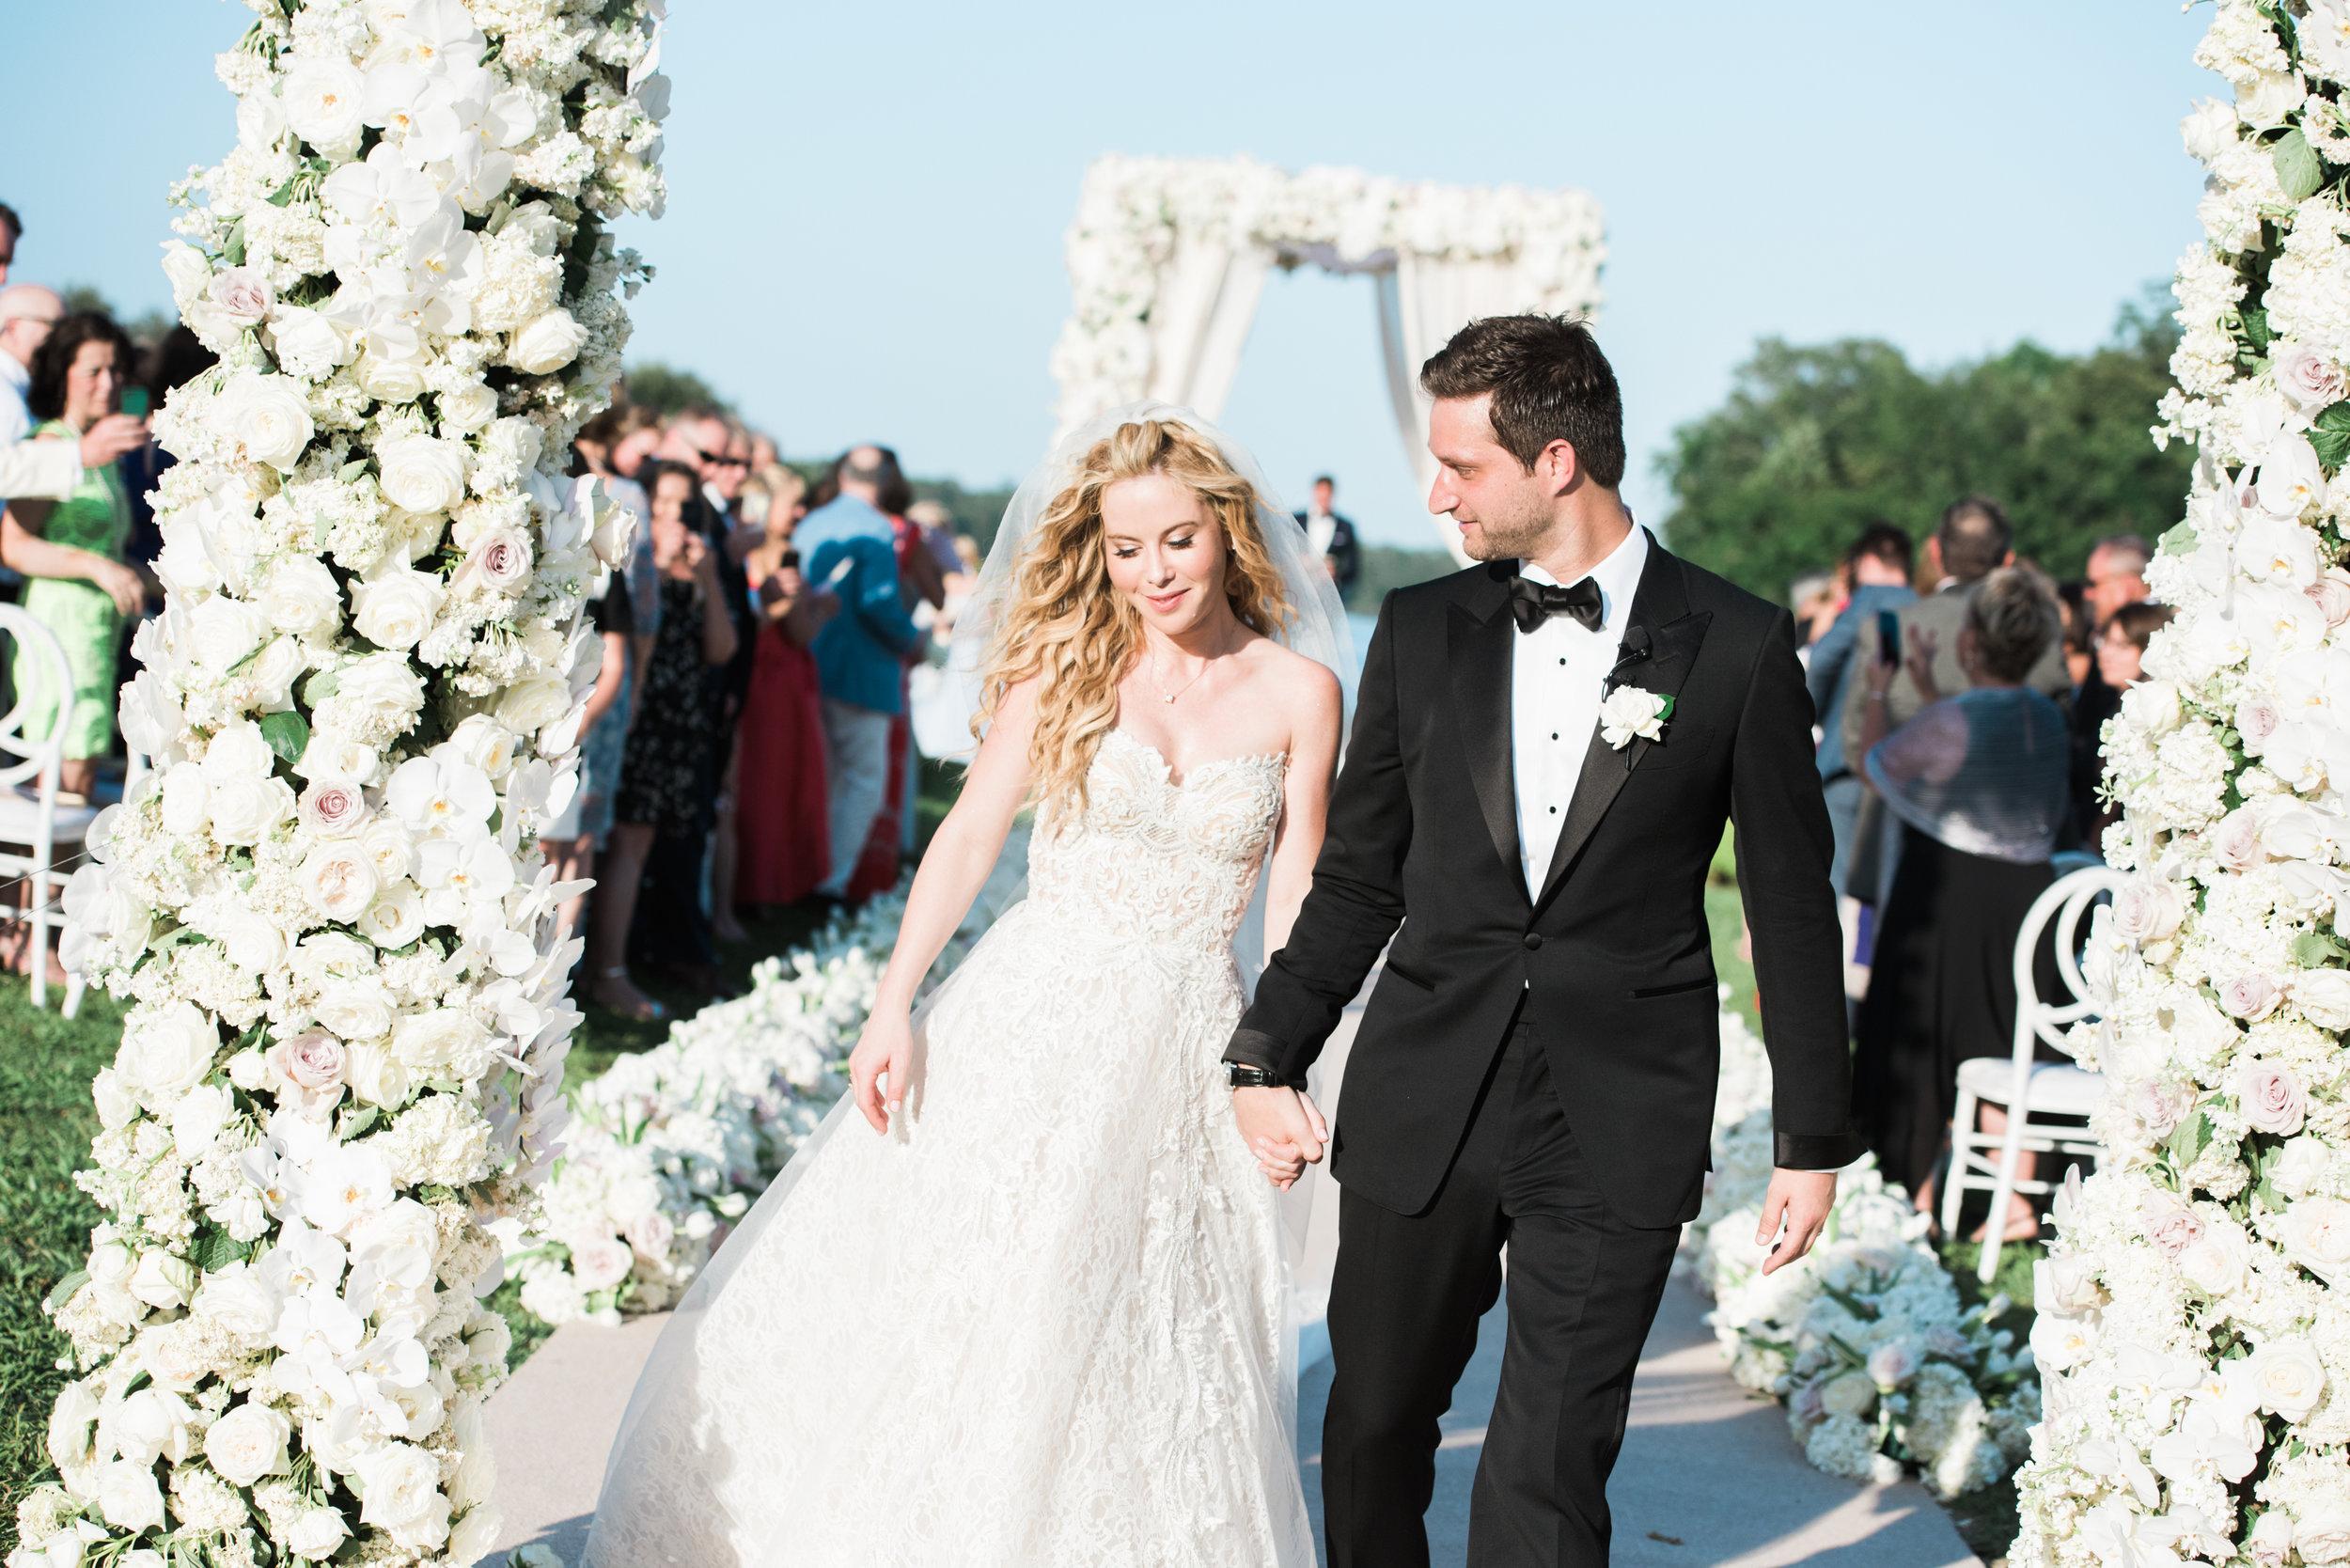 Sylvie-Gil-film-destination-wedding-photography-tara-lipinski-todd-kapostasy